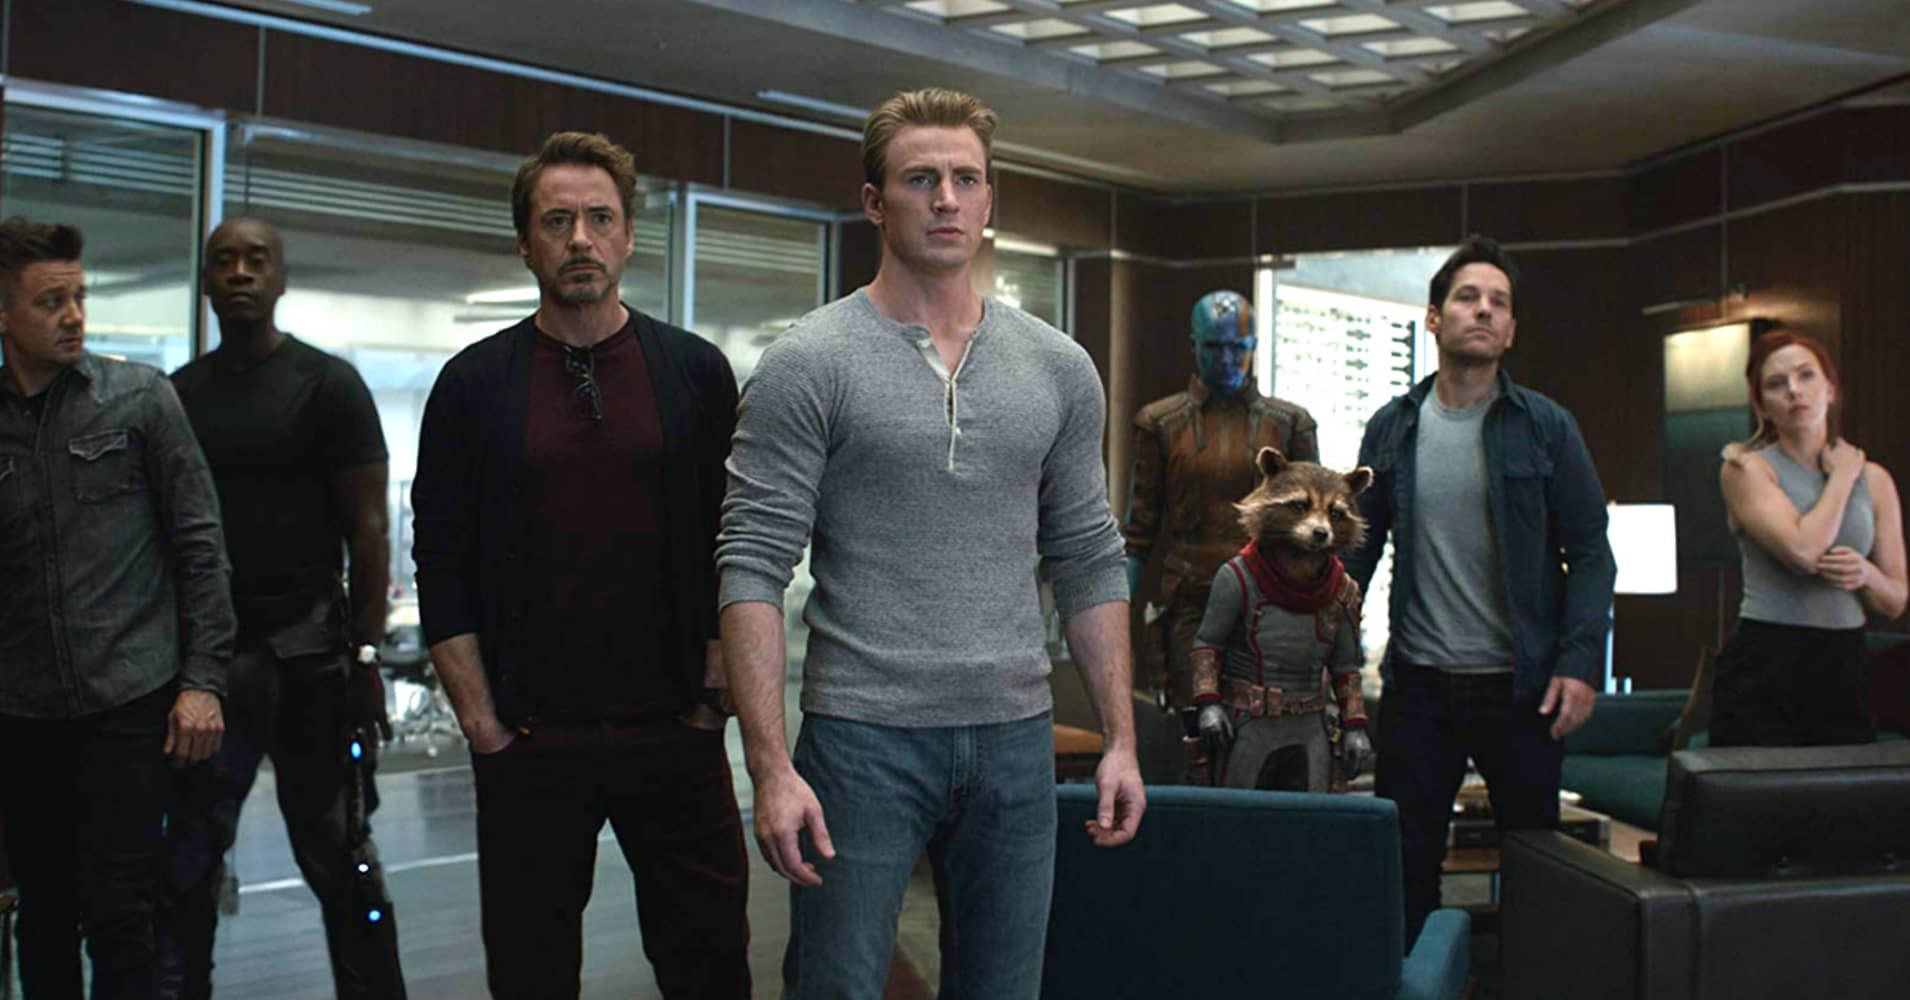 Avengers: Endgame box office records won't include $300 million debut